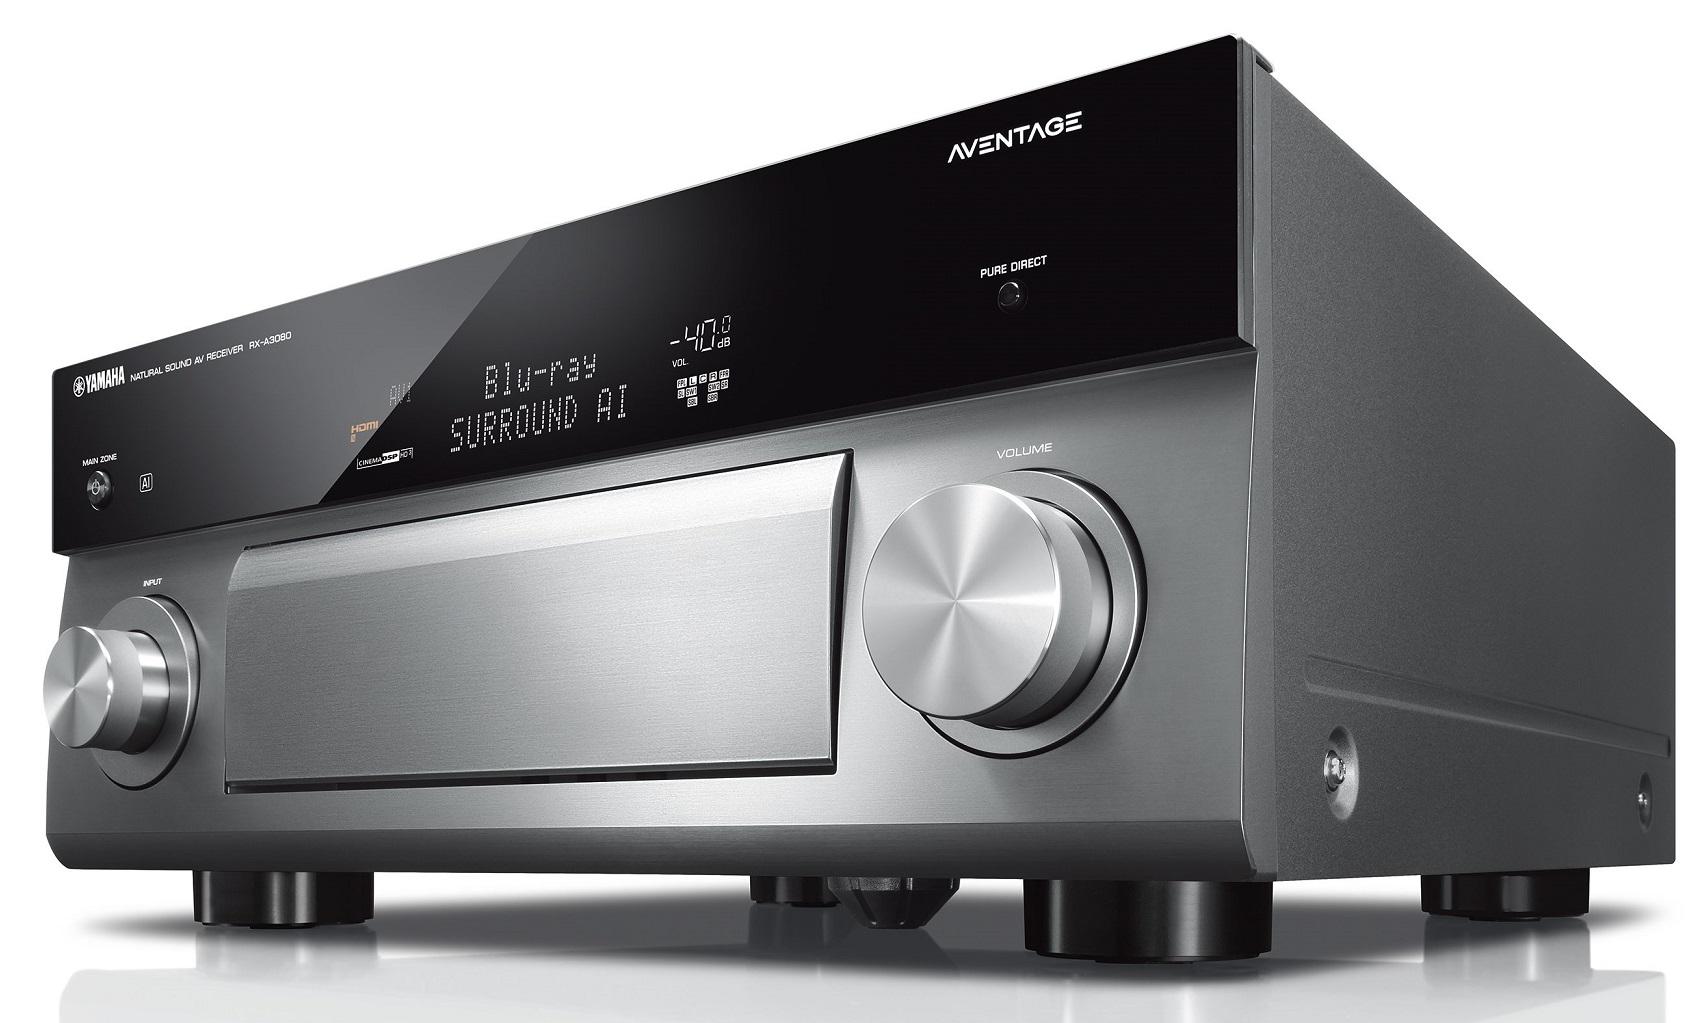 yamaha rx a3080 aventage silver titanium kosmas audio video. Black Bedroom Furniture Sets. Home Design Ideas